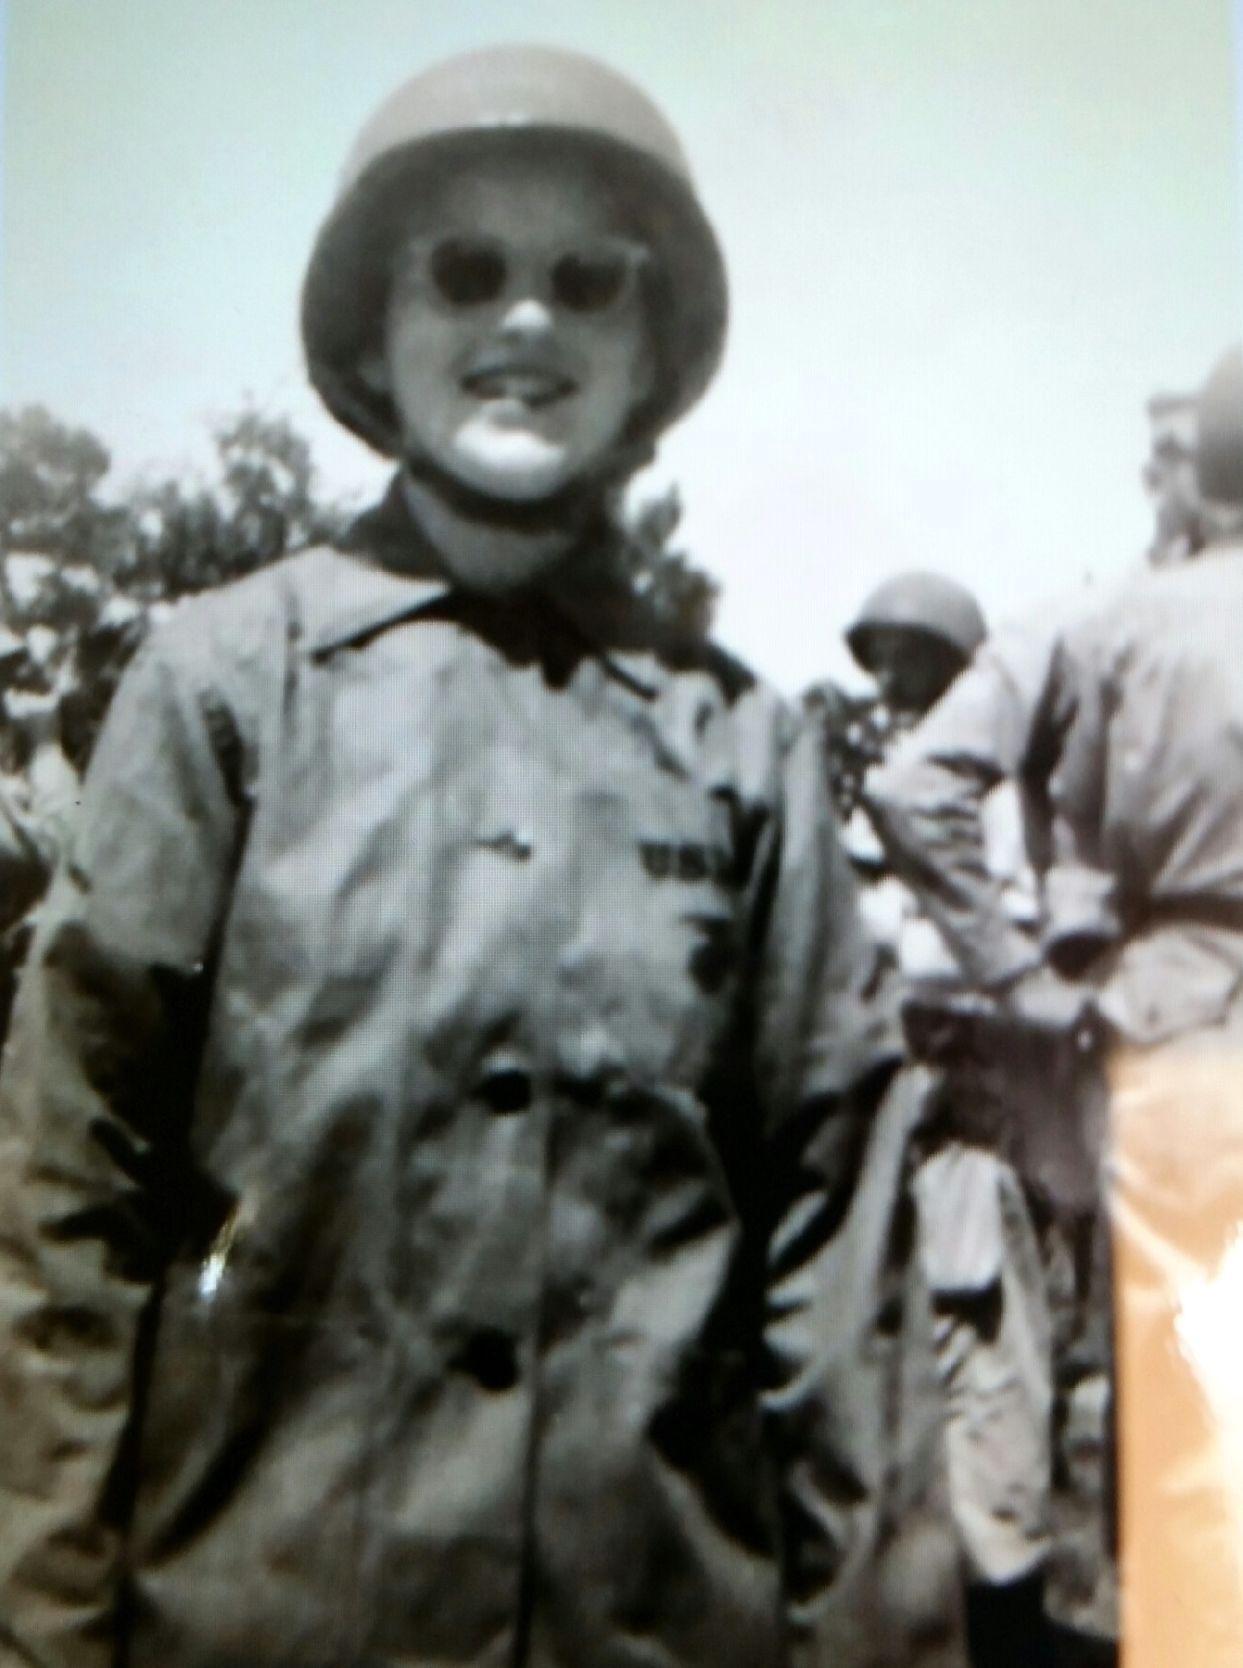 U.S. Marine veteran